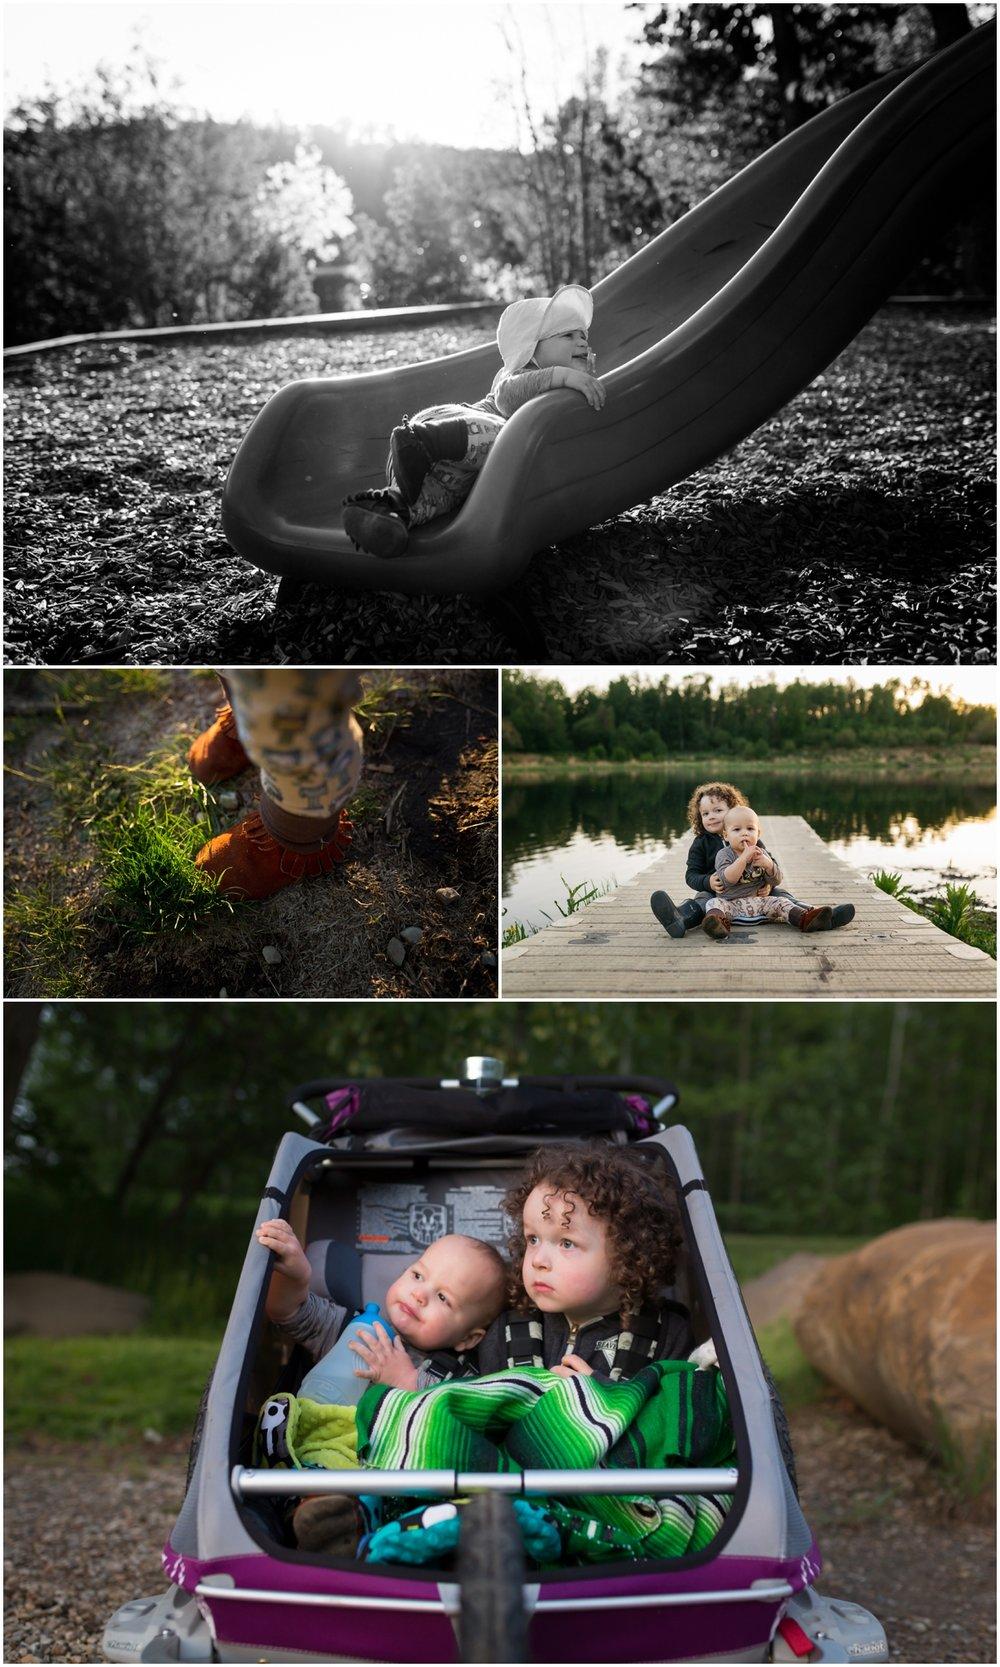 Edmonton Child Photographer - Lifestyle - Best of 2016 - Brothers